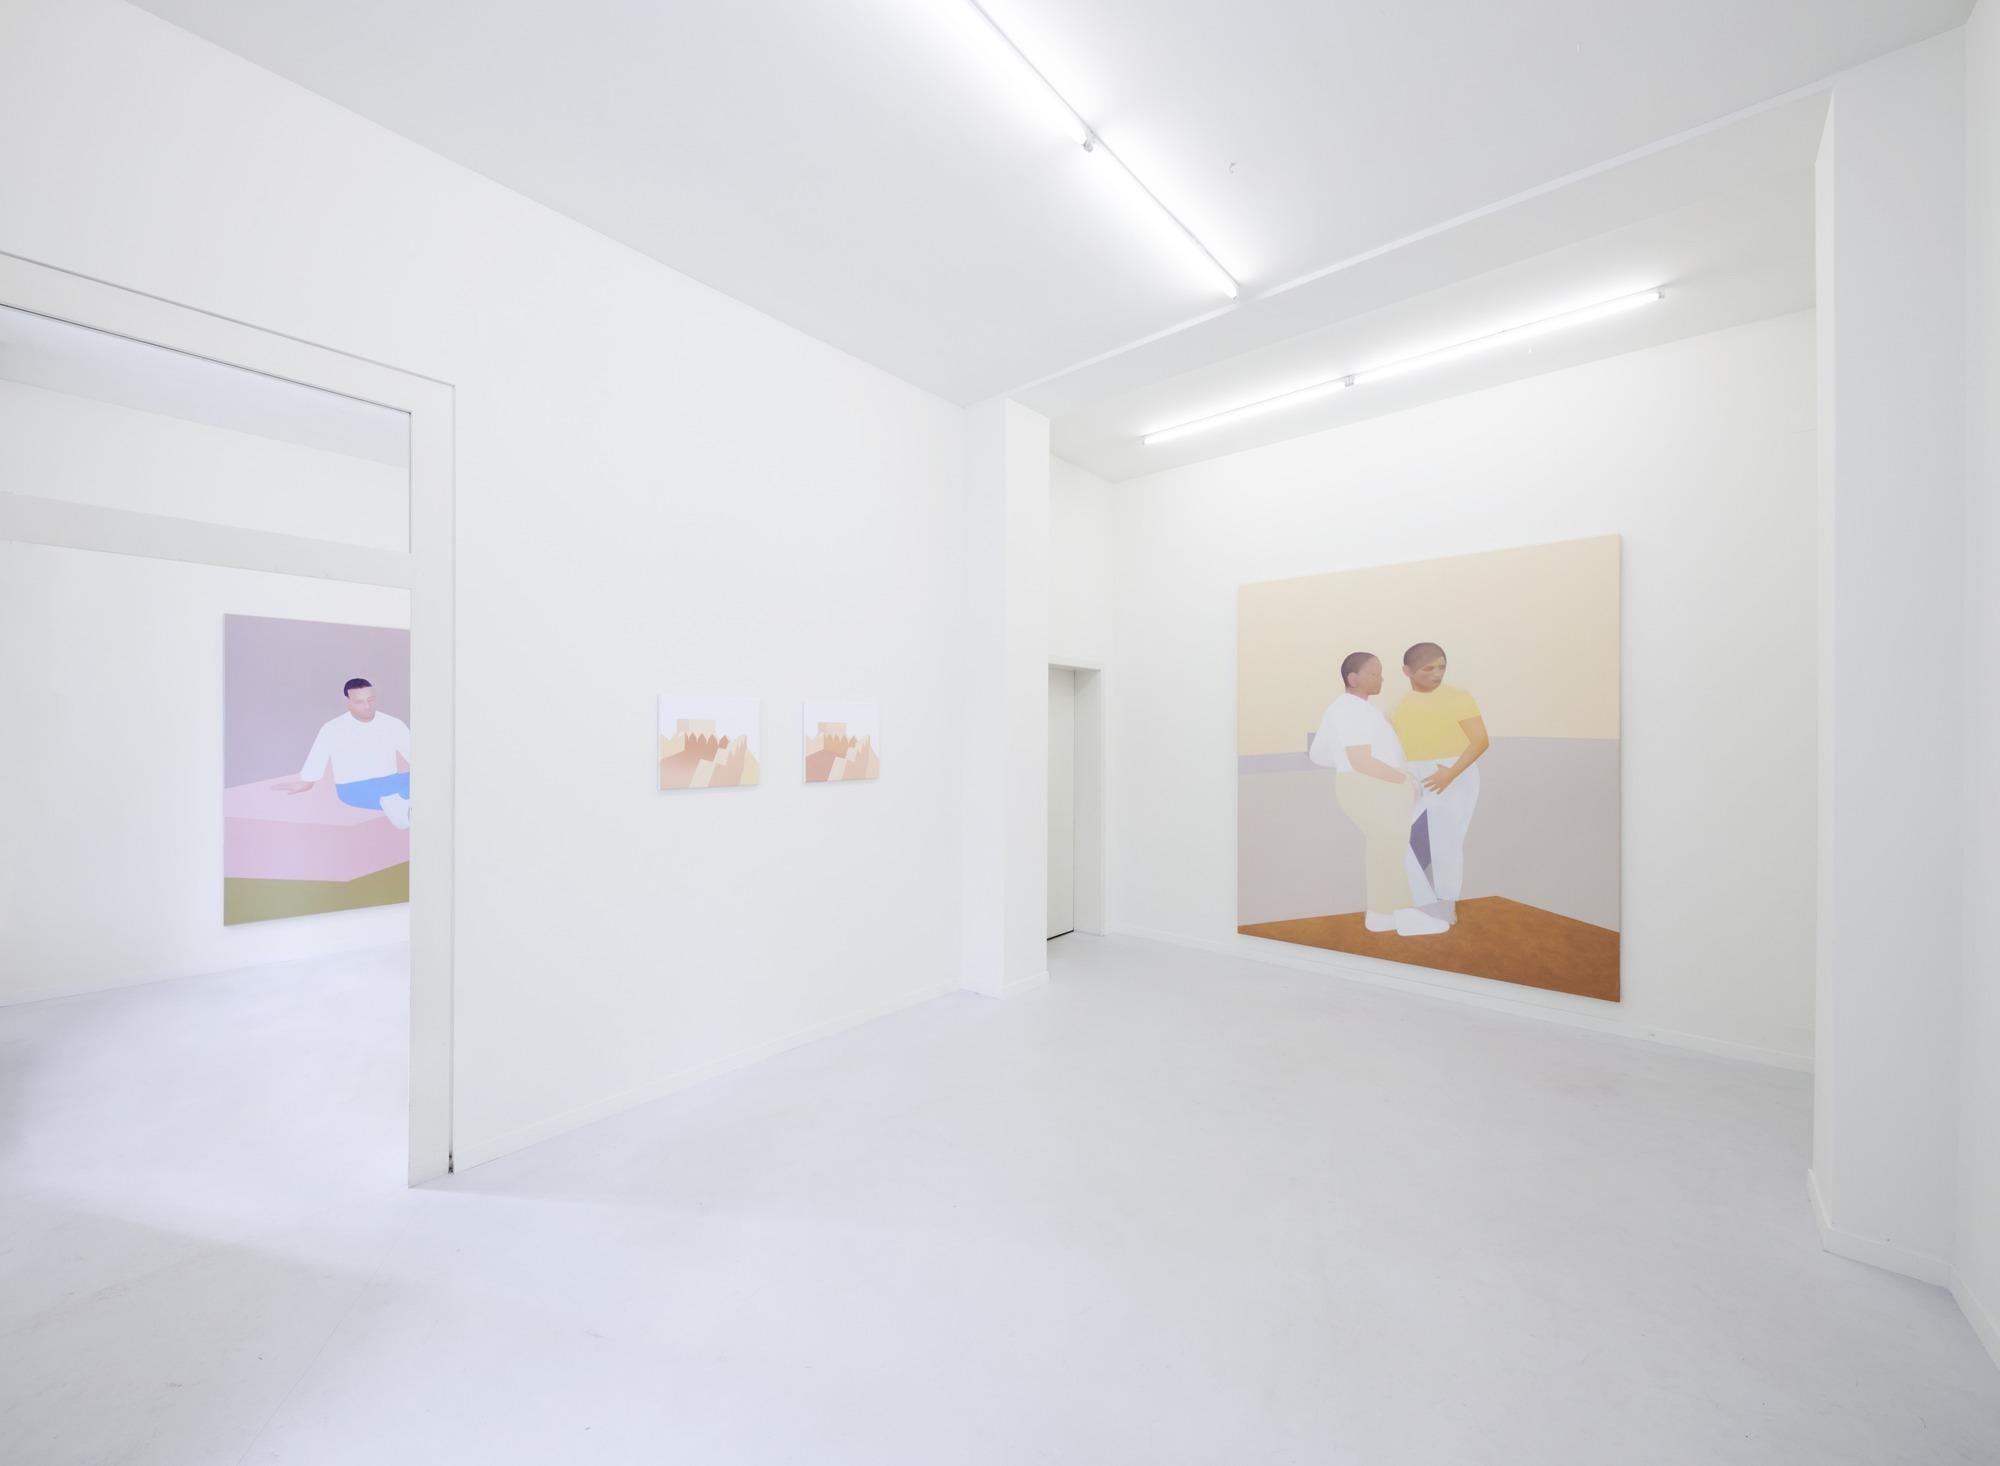 Manuel Stehli untitled, 2020, 200×170 cm, oil on canvas & Manuel Stehli untitled (Festung I, Festung II) & untitled, 2020, 240×190 cm, oil on canvas, Courtesy of the artist and Lemoyne